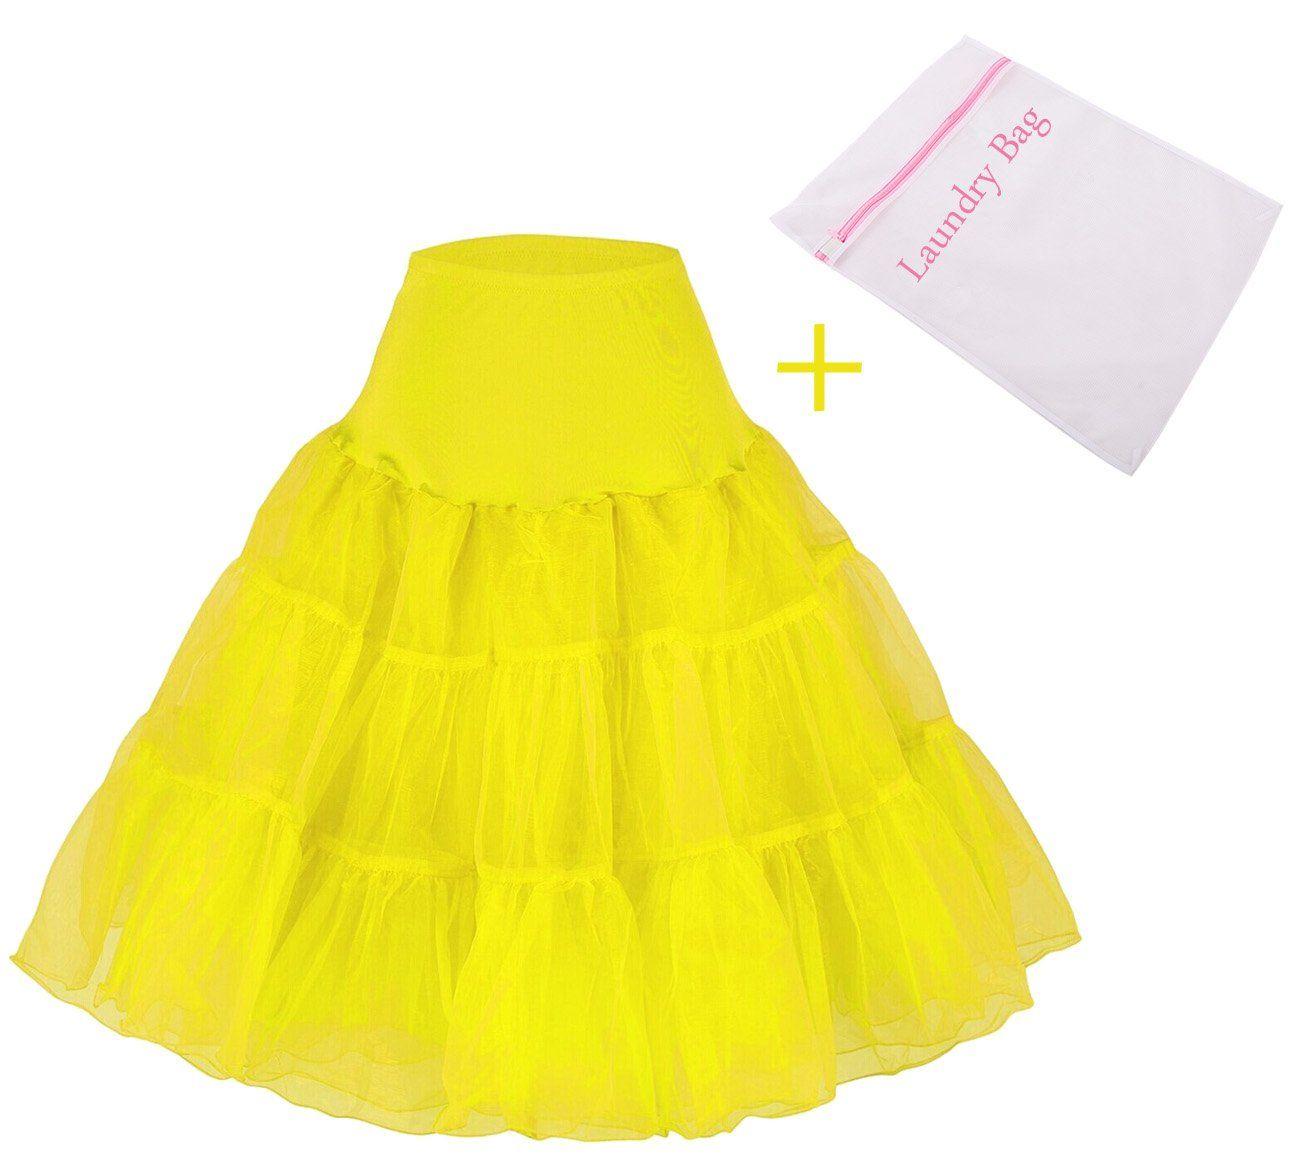 Tidetell Vintage 50s Rockabilly Crinoline Tutu Skirt Petticoat Bridal Slip+Bag Yellow